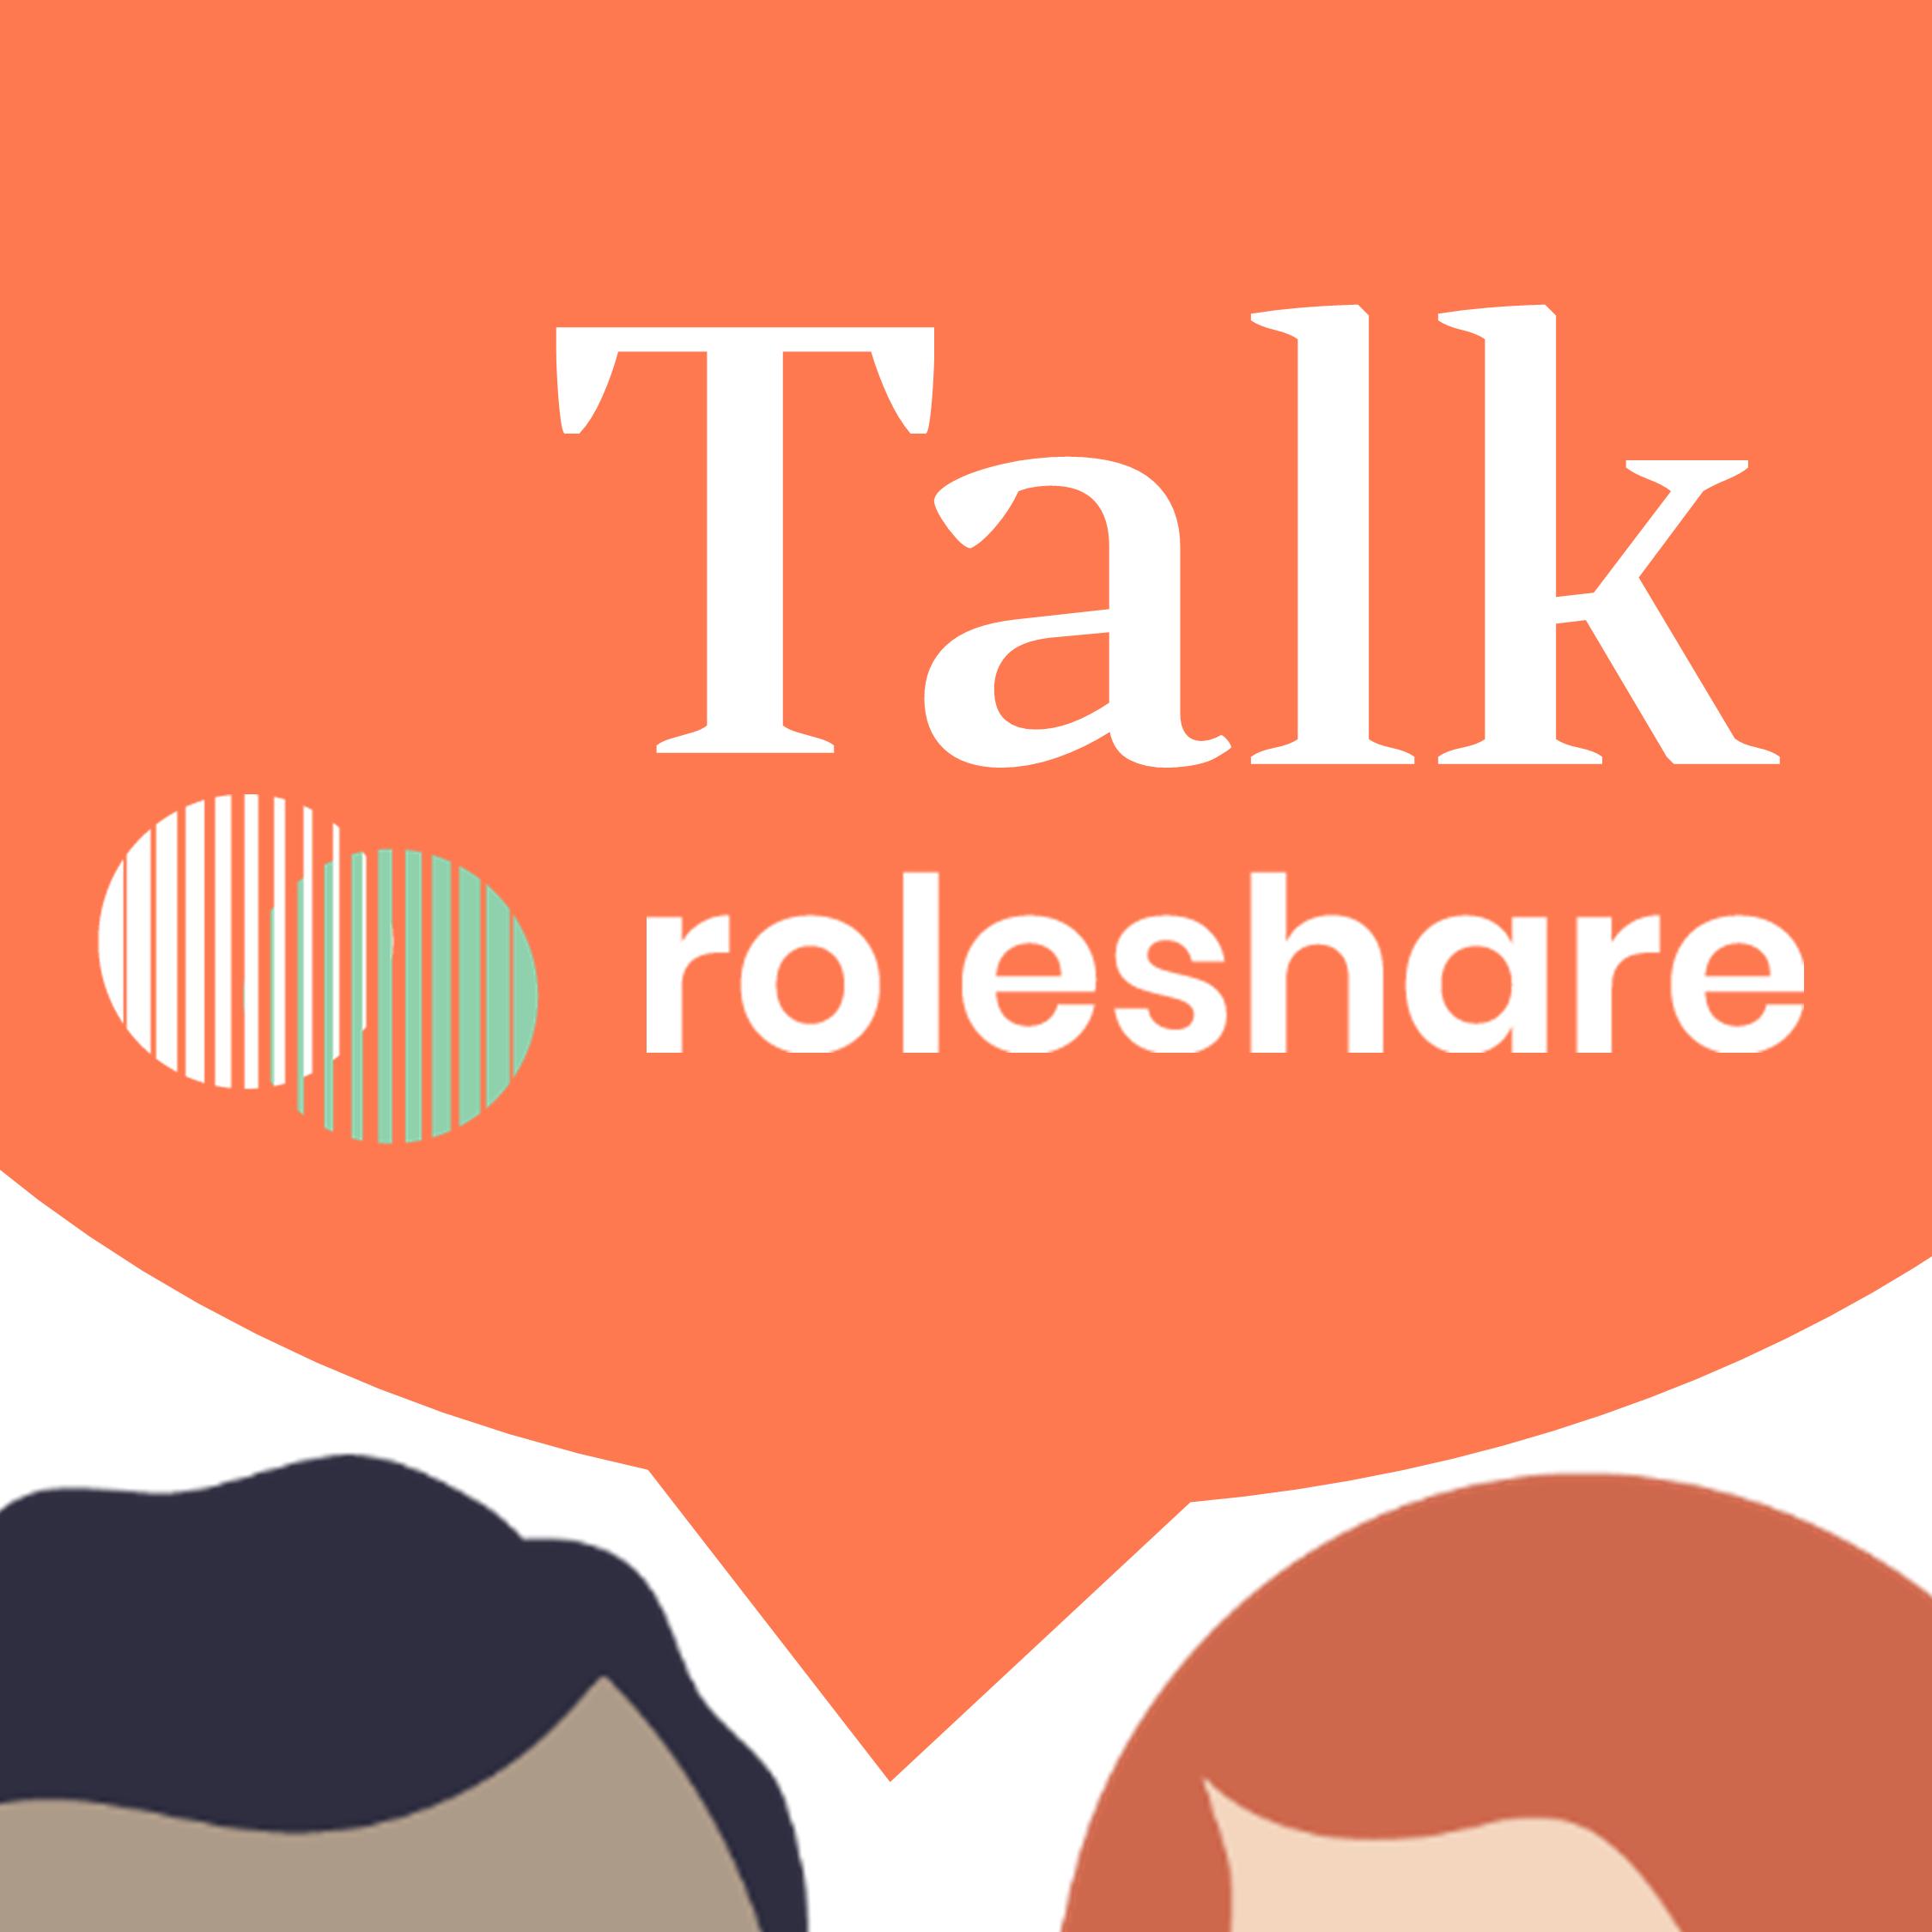 Talk Roleshare